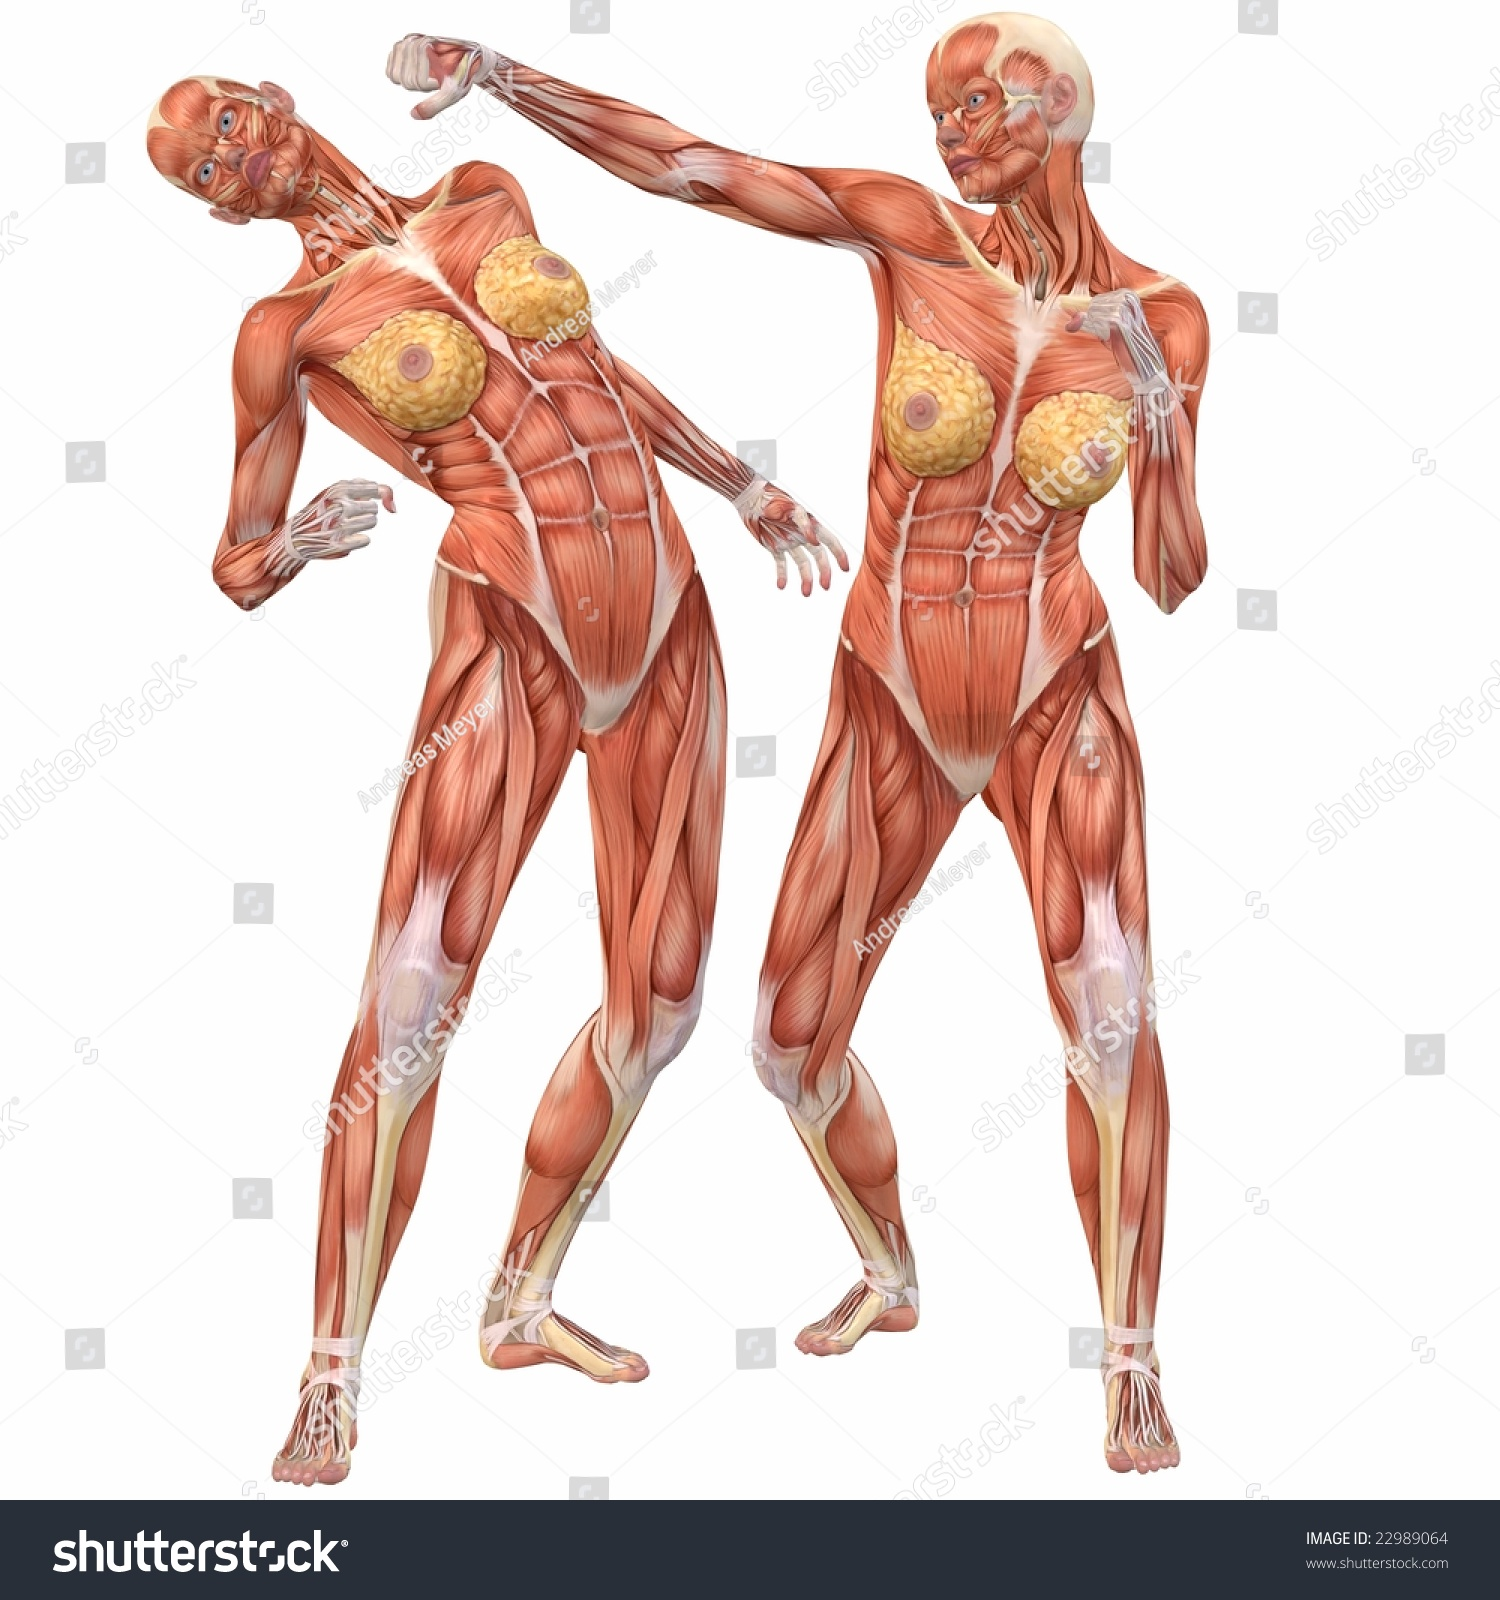 Female Human Body Anatomy Street Fight Stock Illustration 22989064 ...